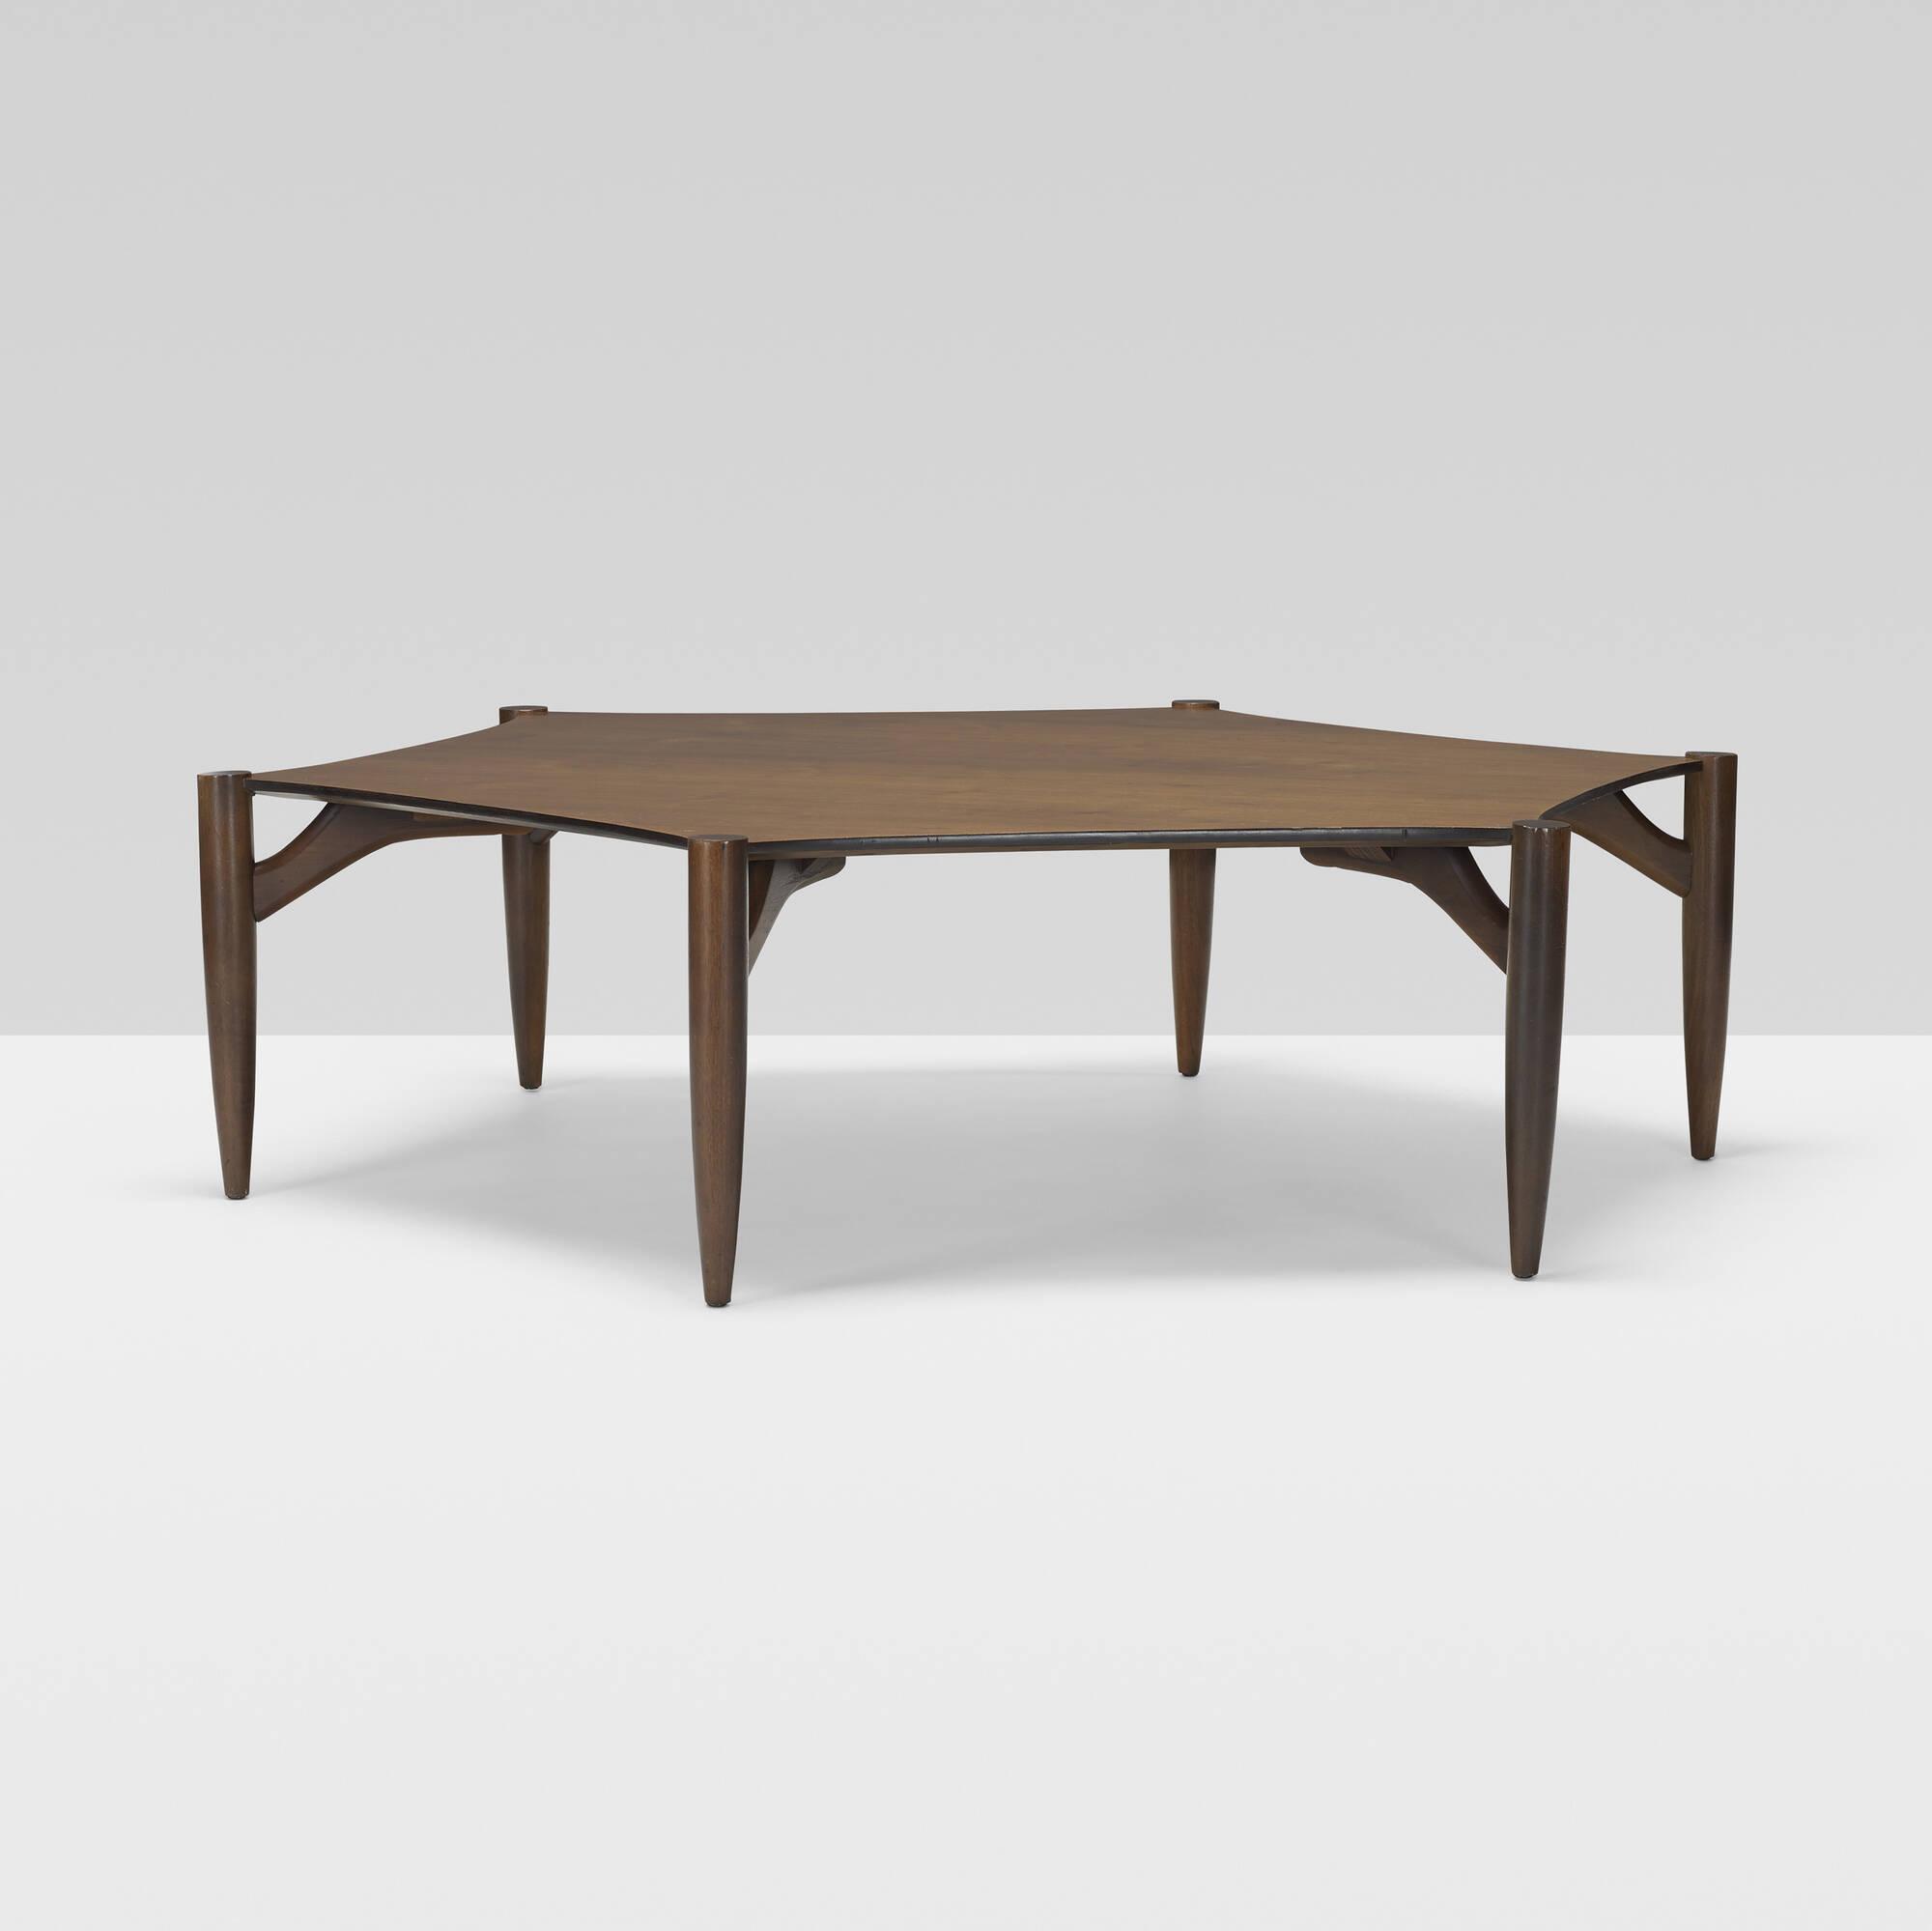 198 greta magnusson grossman rare octagonal coffee table 198 greta magnusson grossman rare octagonal coffee table 1 of 2 geotapseo Gallery